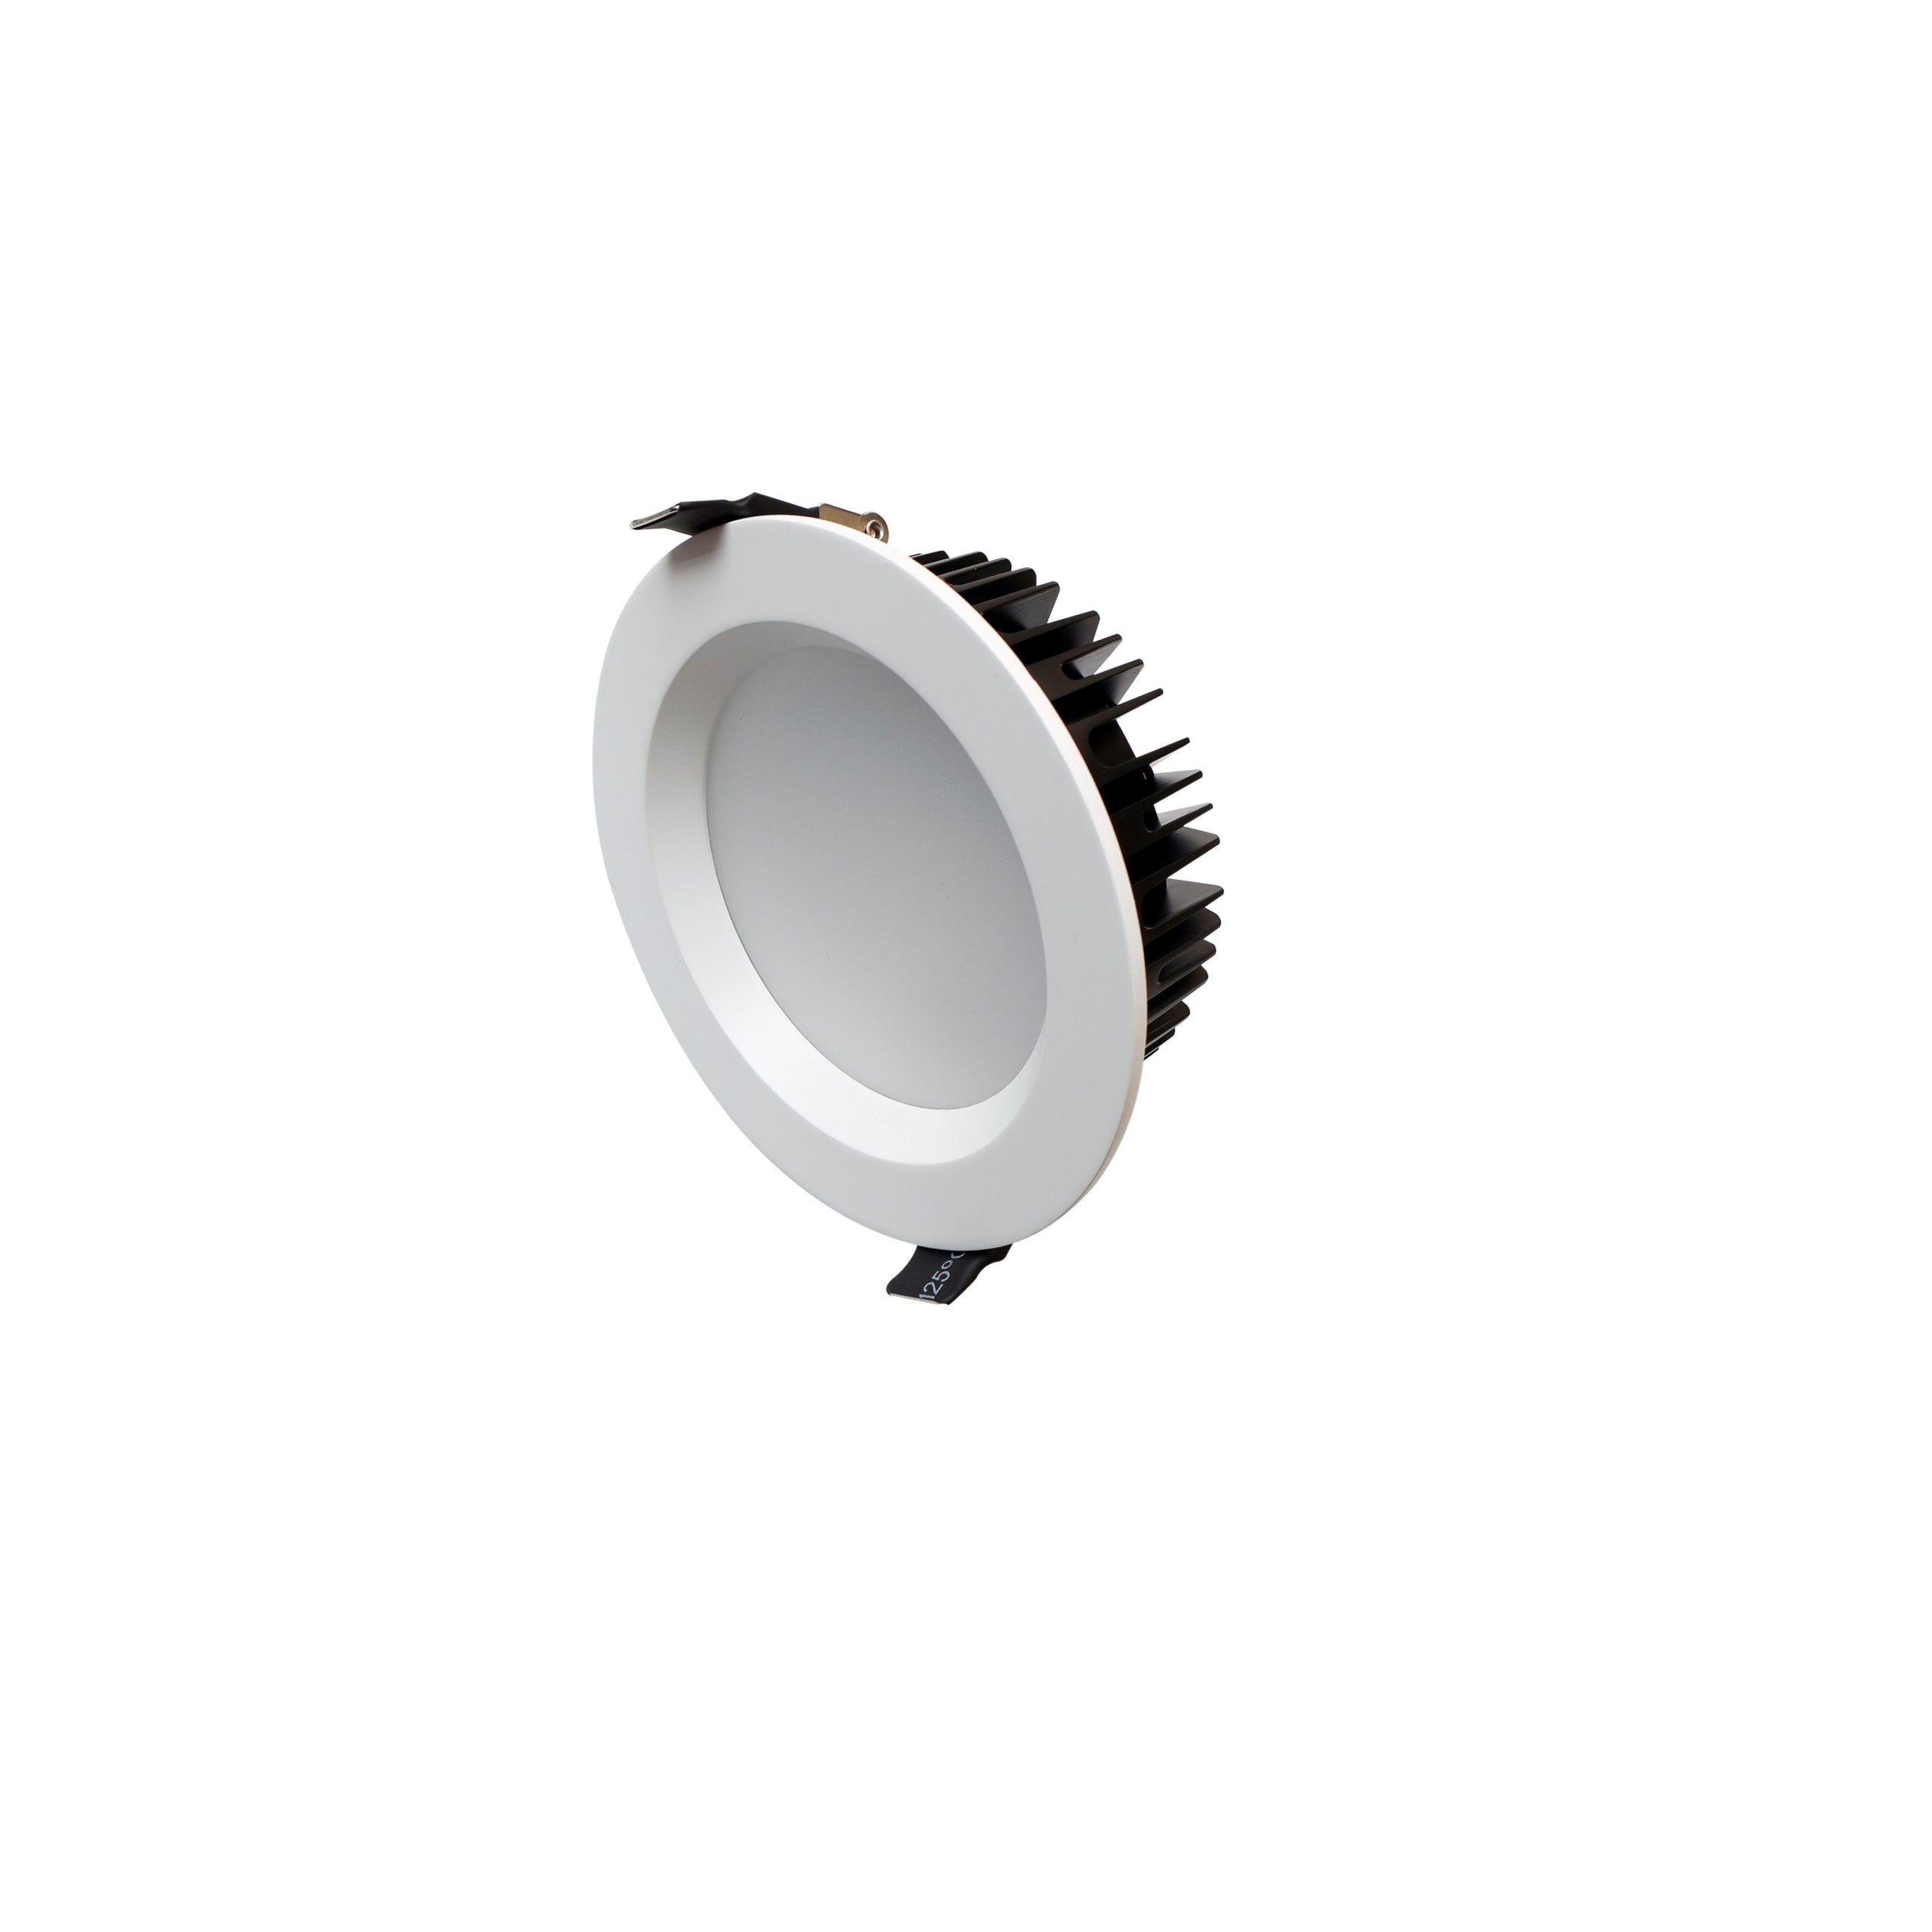 CL10-Dish95 Image